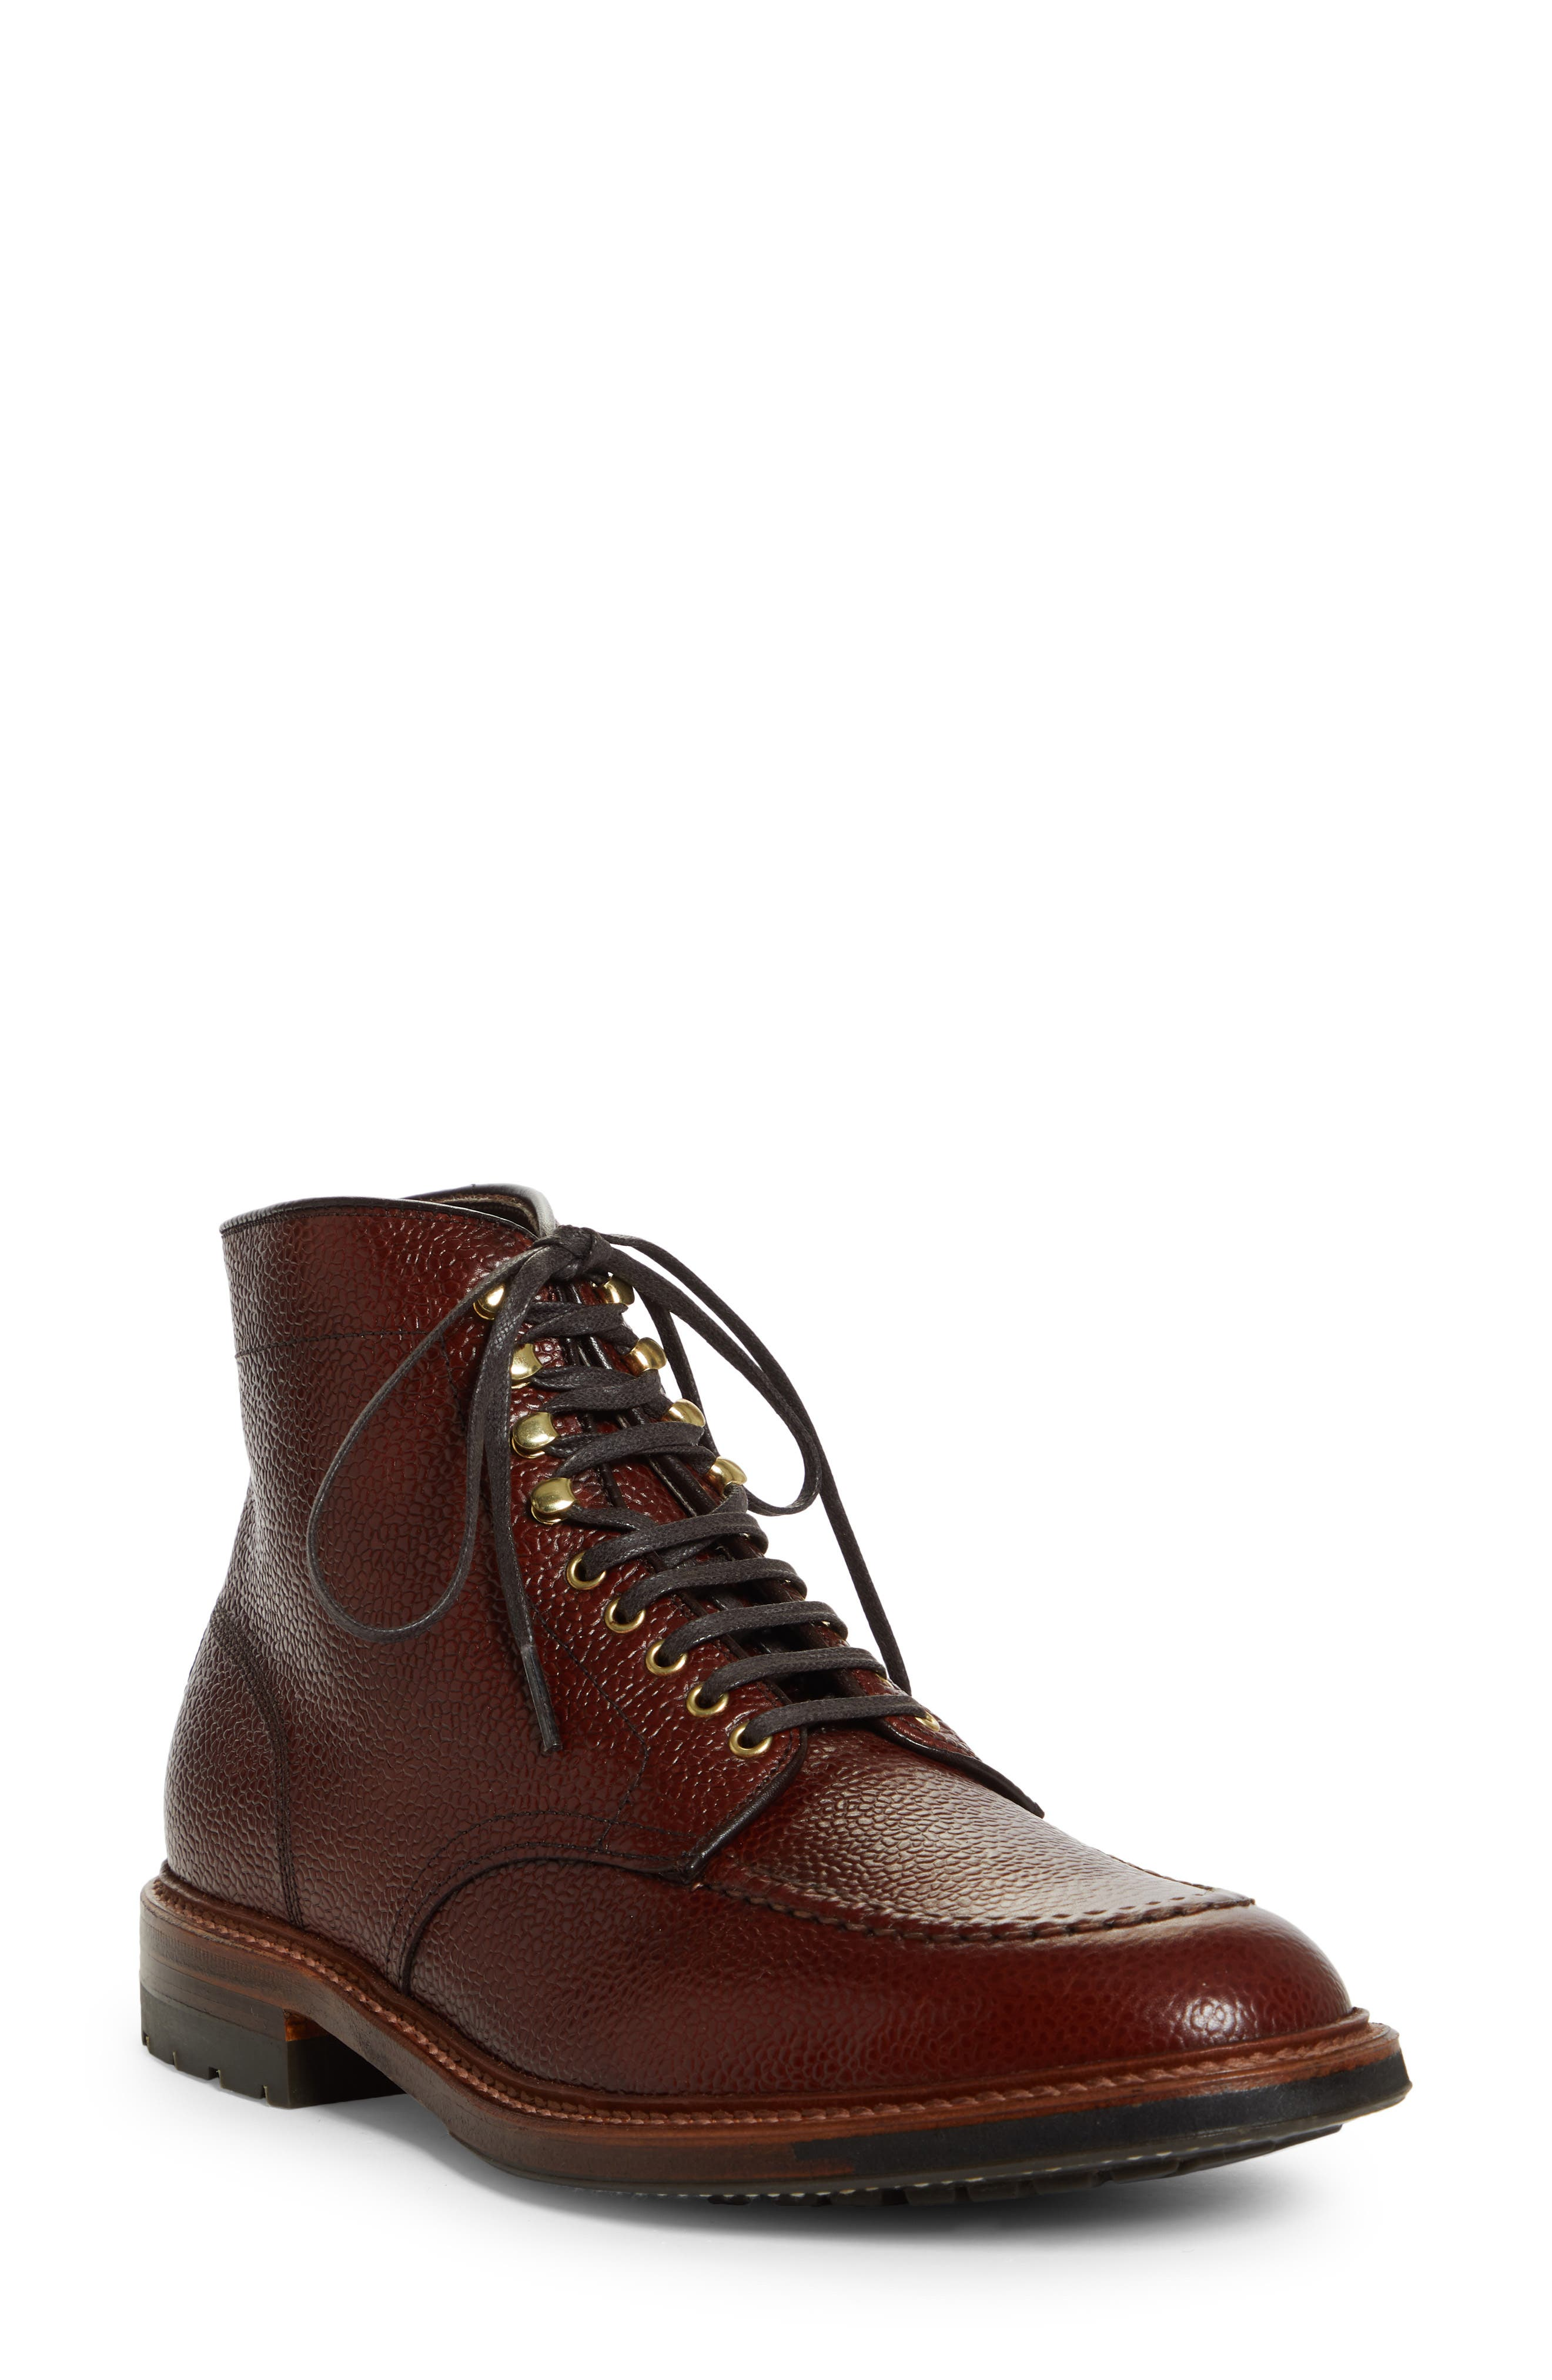 Alden Moc Toe Blucher Boot